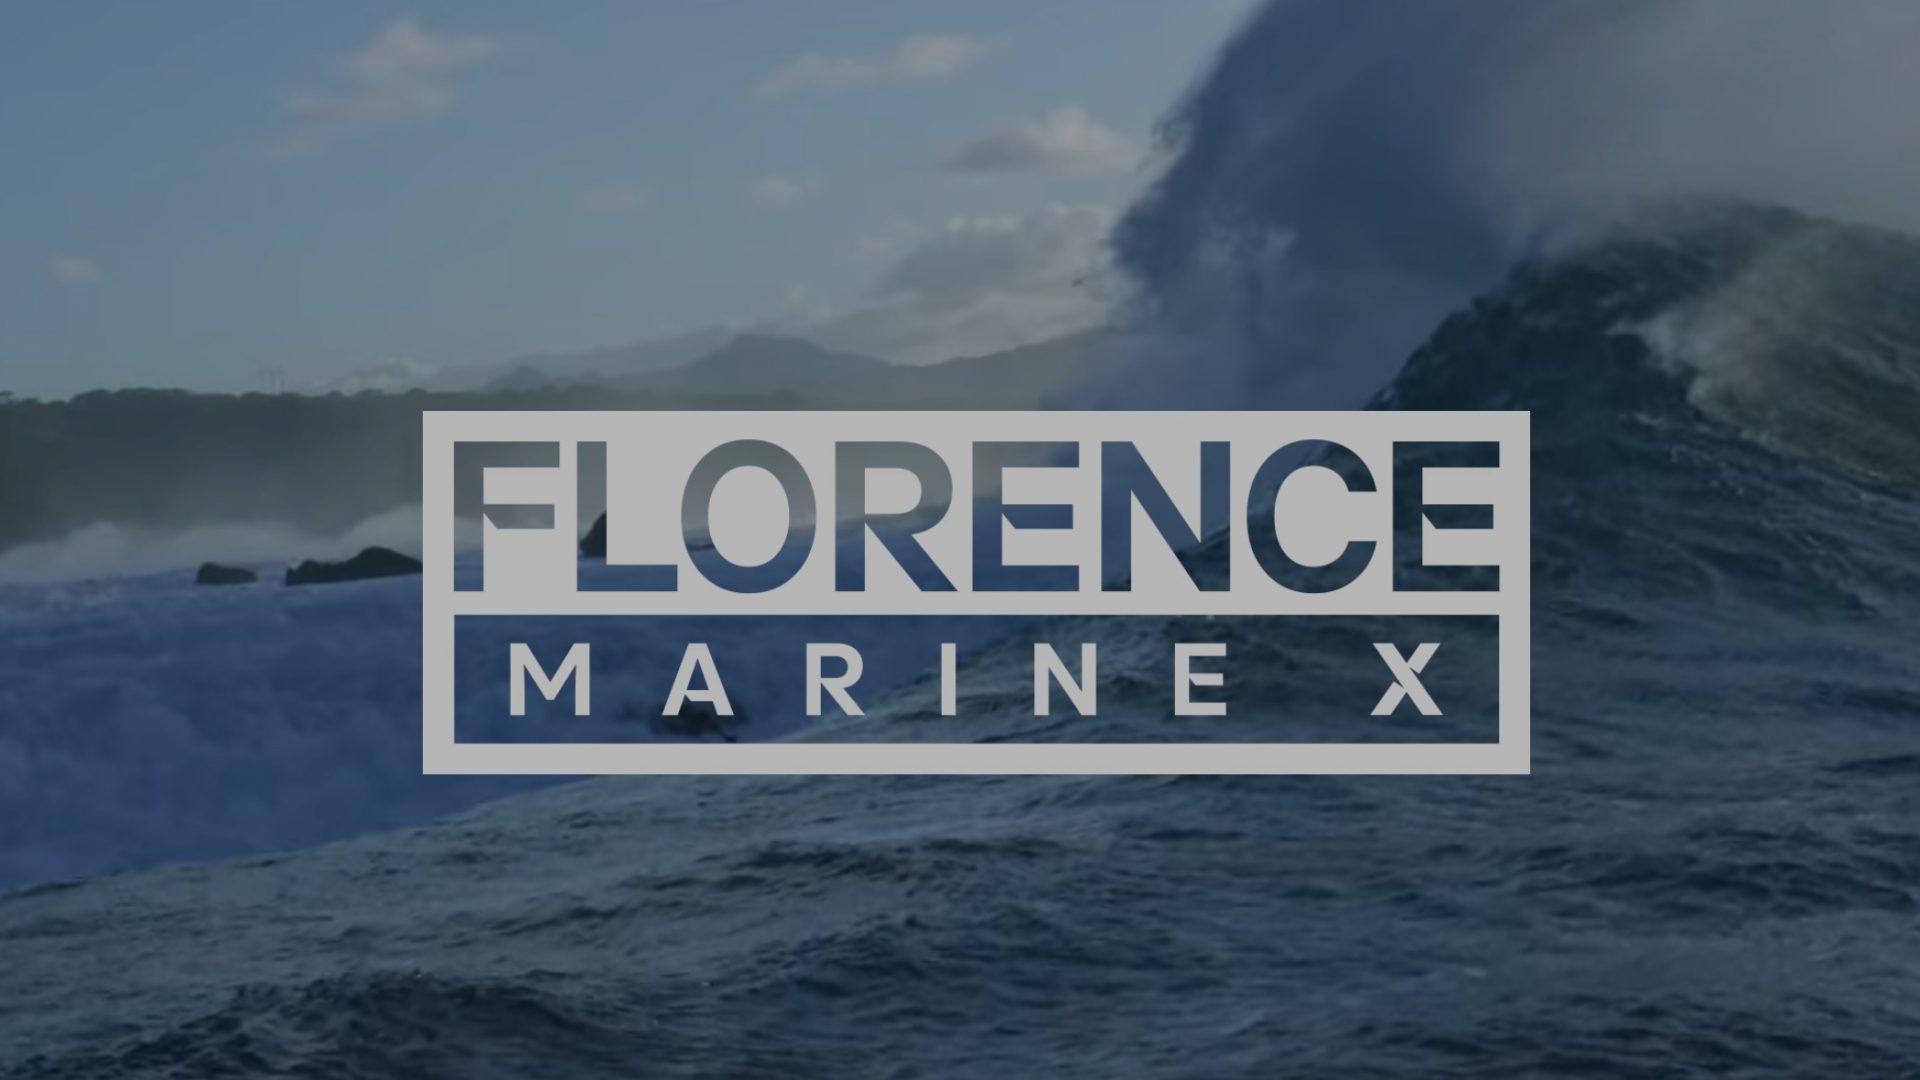 Florence Marine X